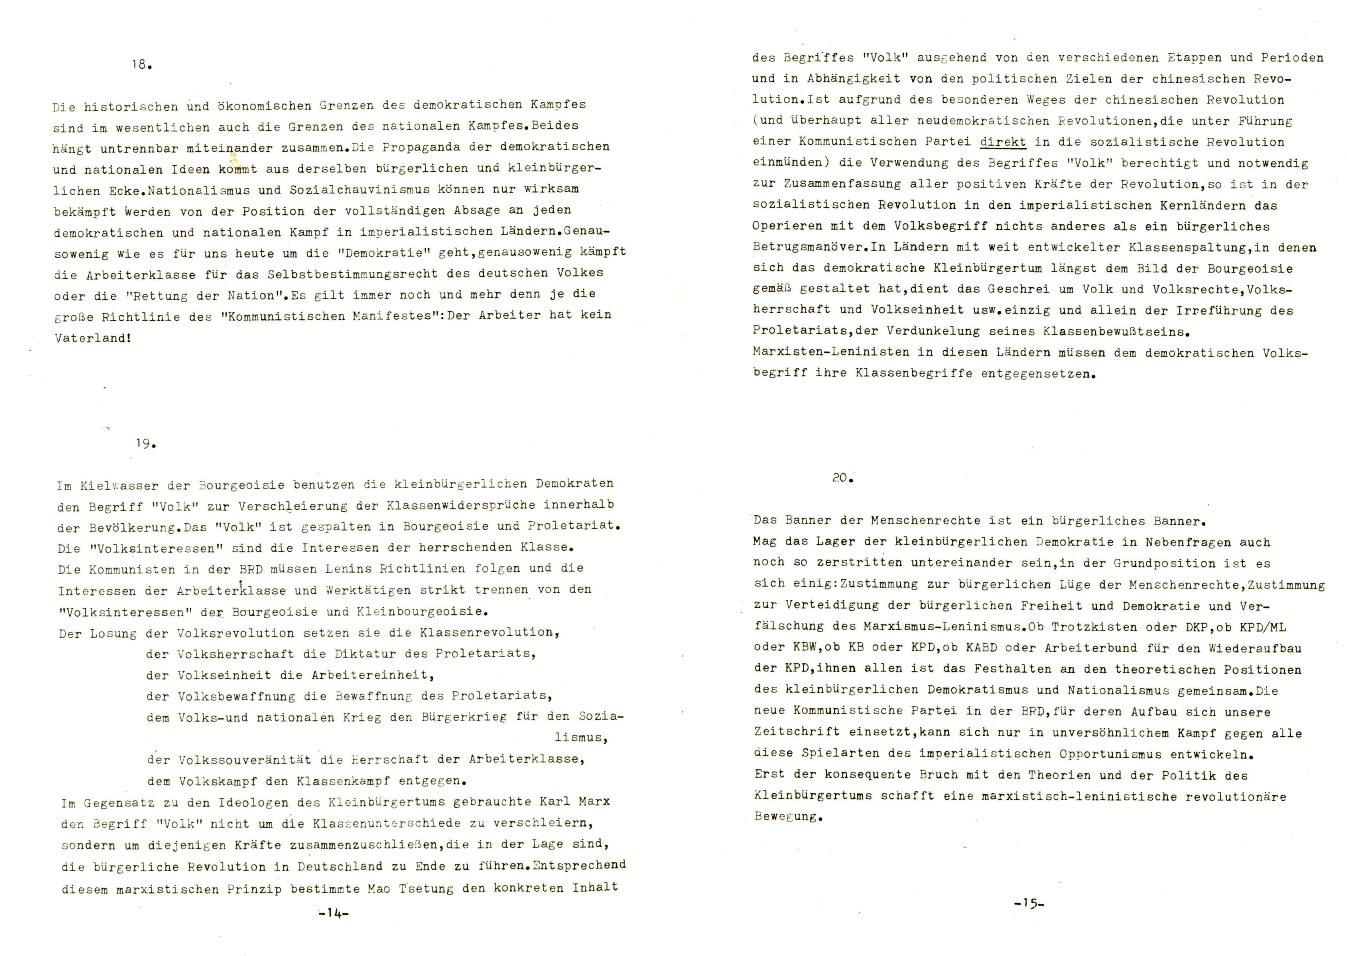 Muenchen_Kampf_dem_Revisionismus_1978_06_08